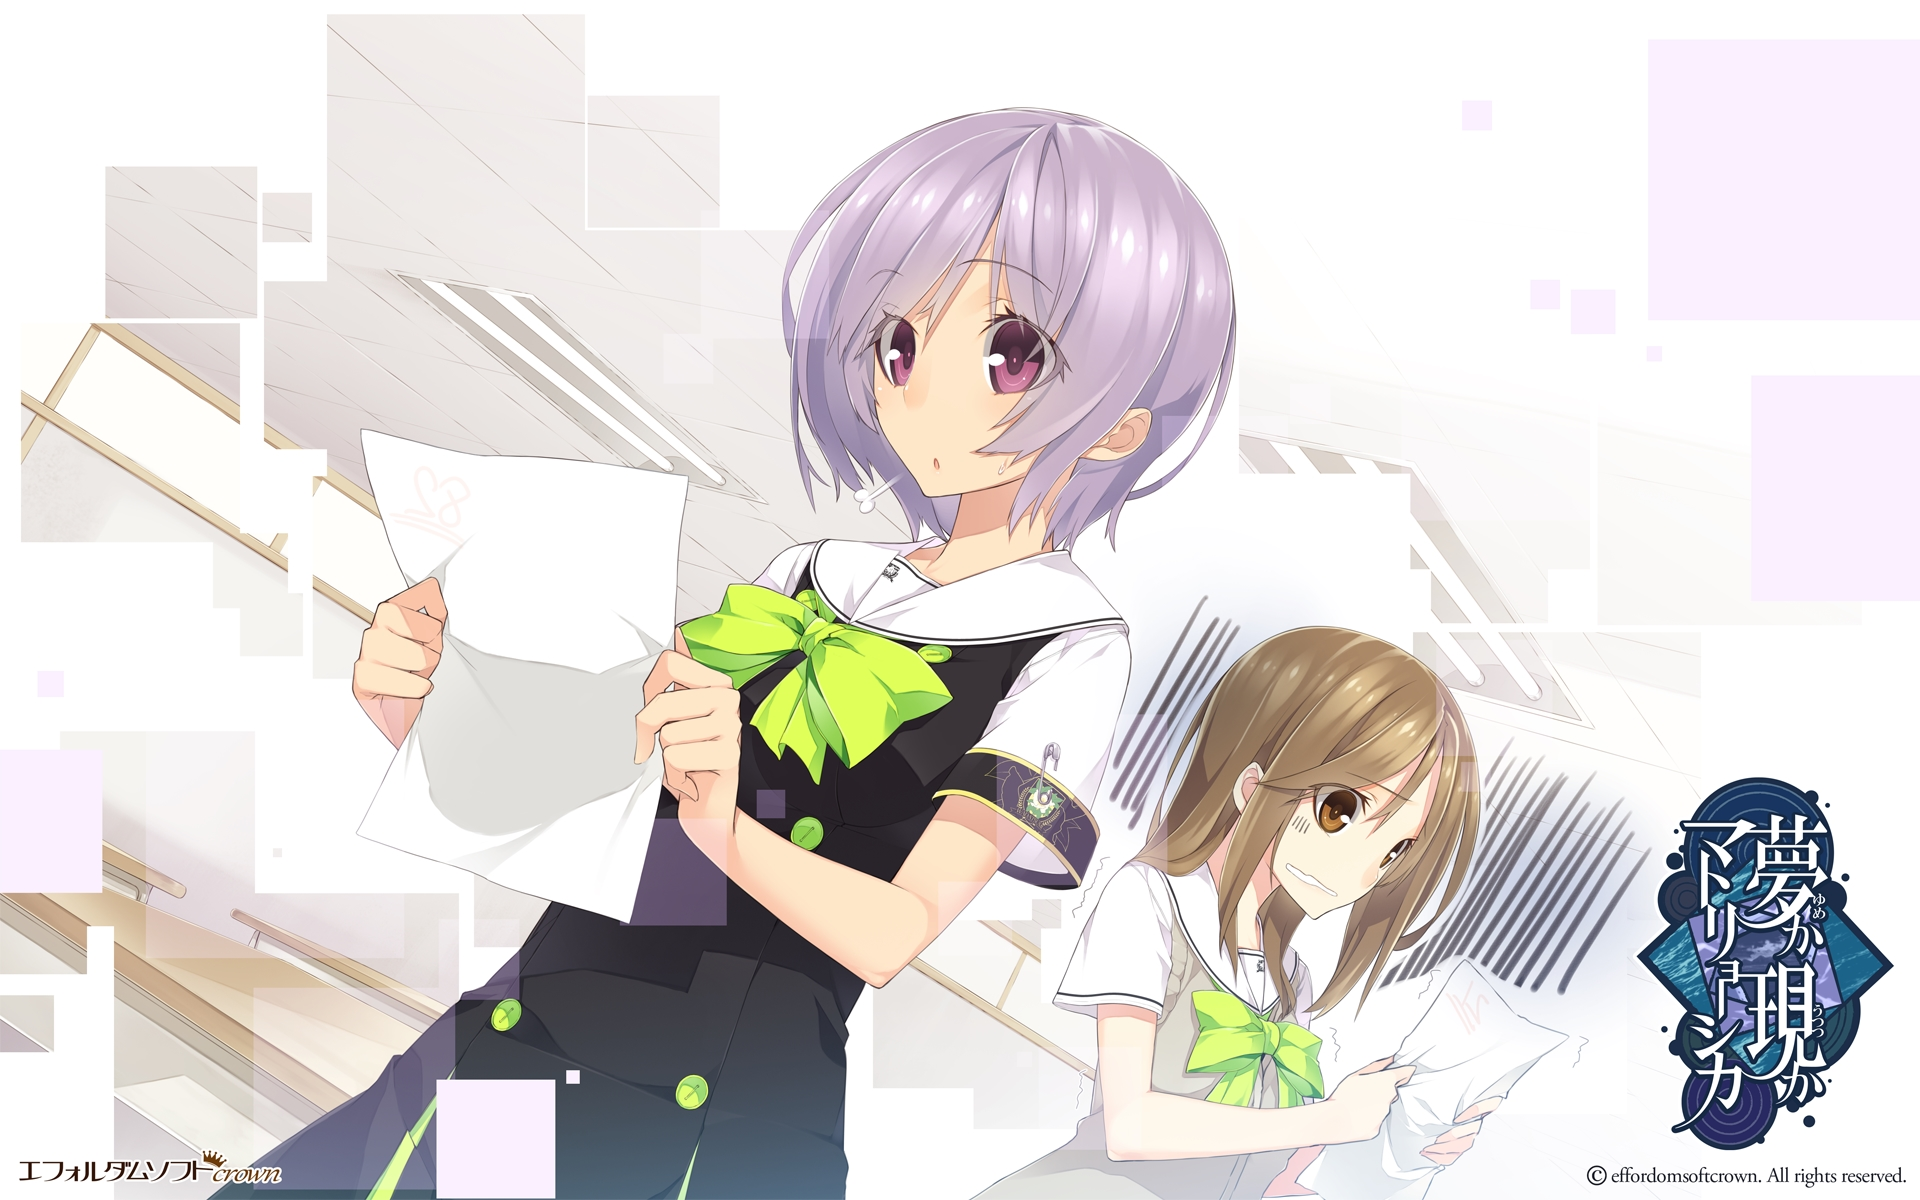 Yume Ka Utsutsu Ka Matryoshka Backgrounds, Compatible - PC, Mobile, Gadgets| 1920x1200 px